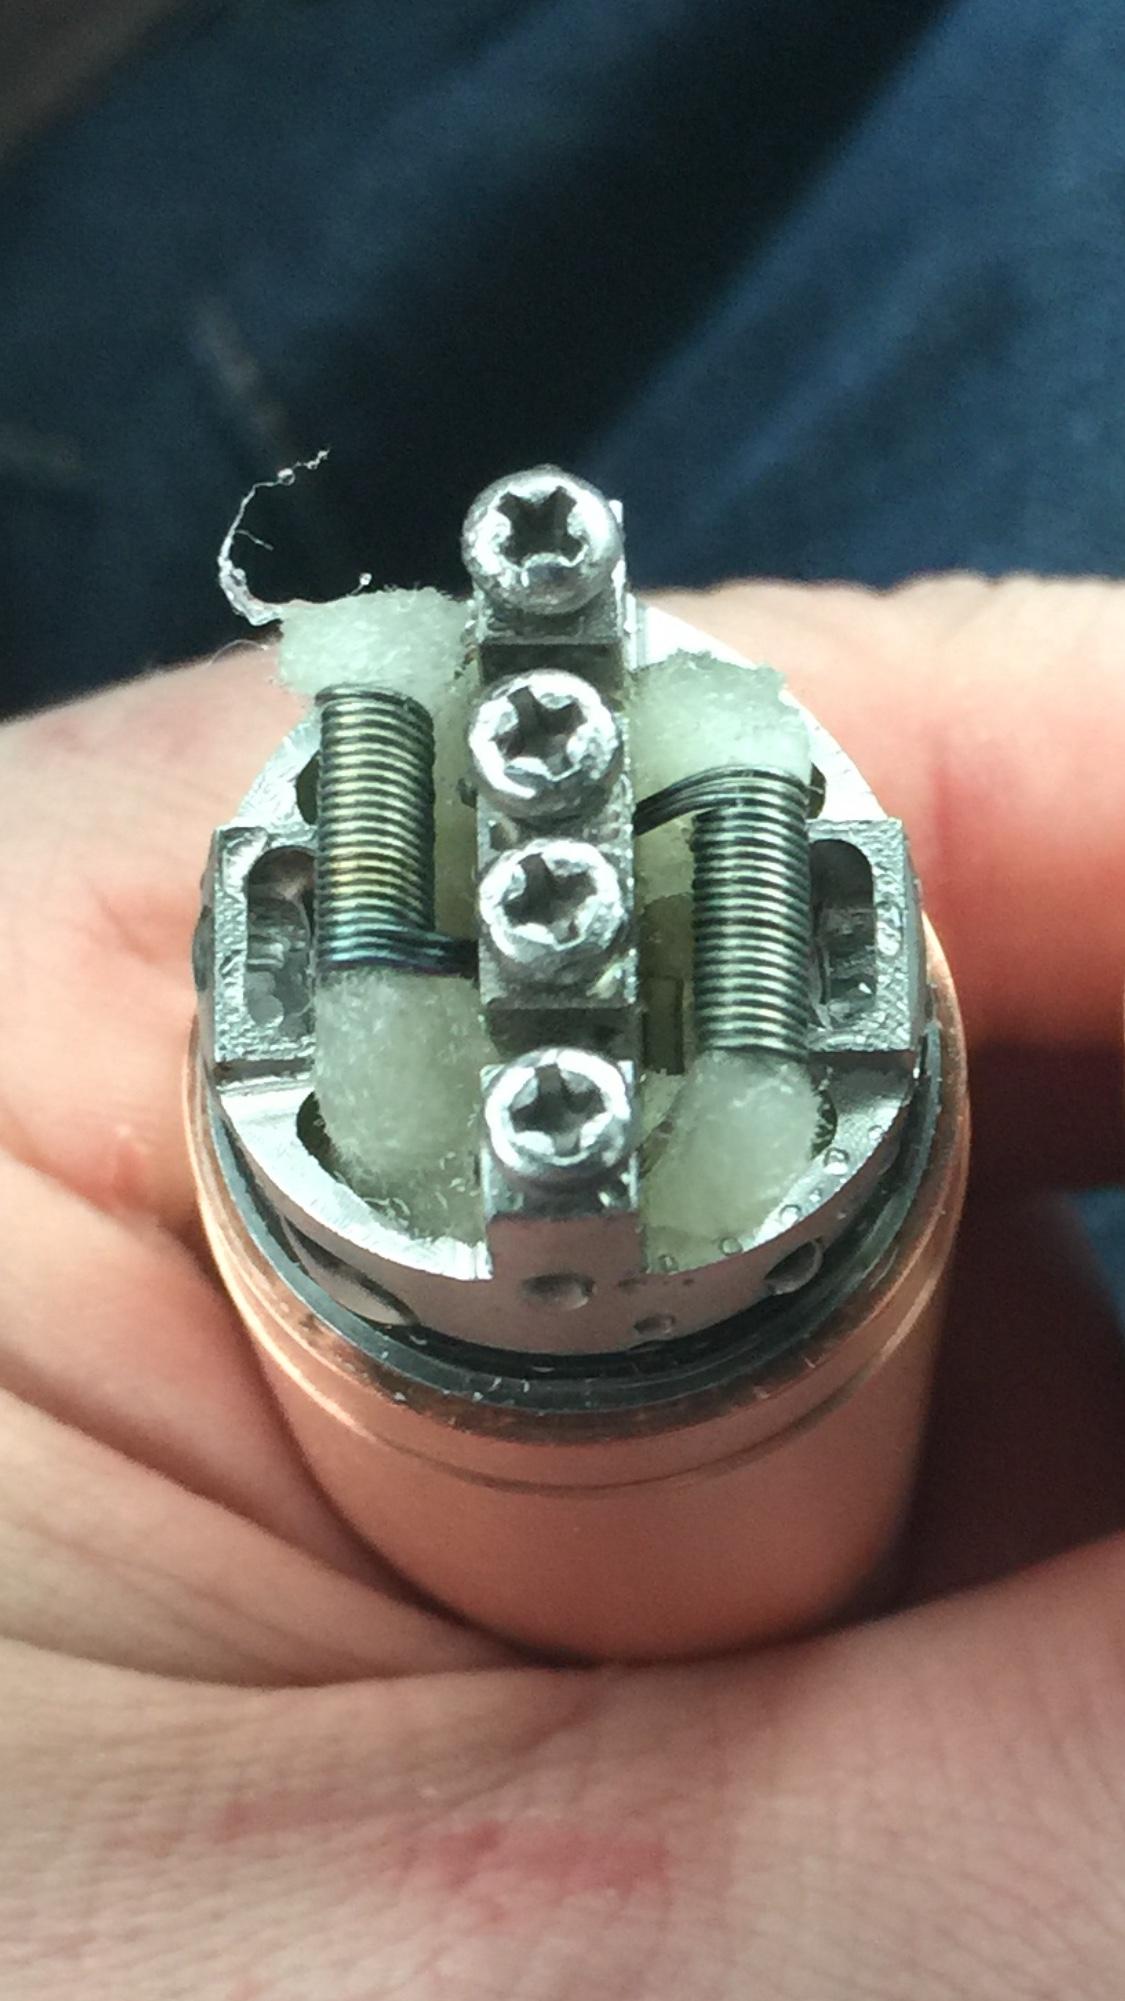 LF good 26g single & dual coil builds for a single 18650 mech